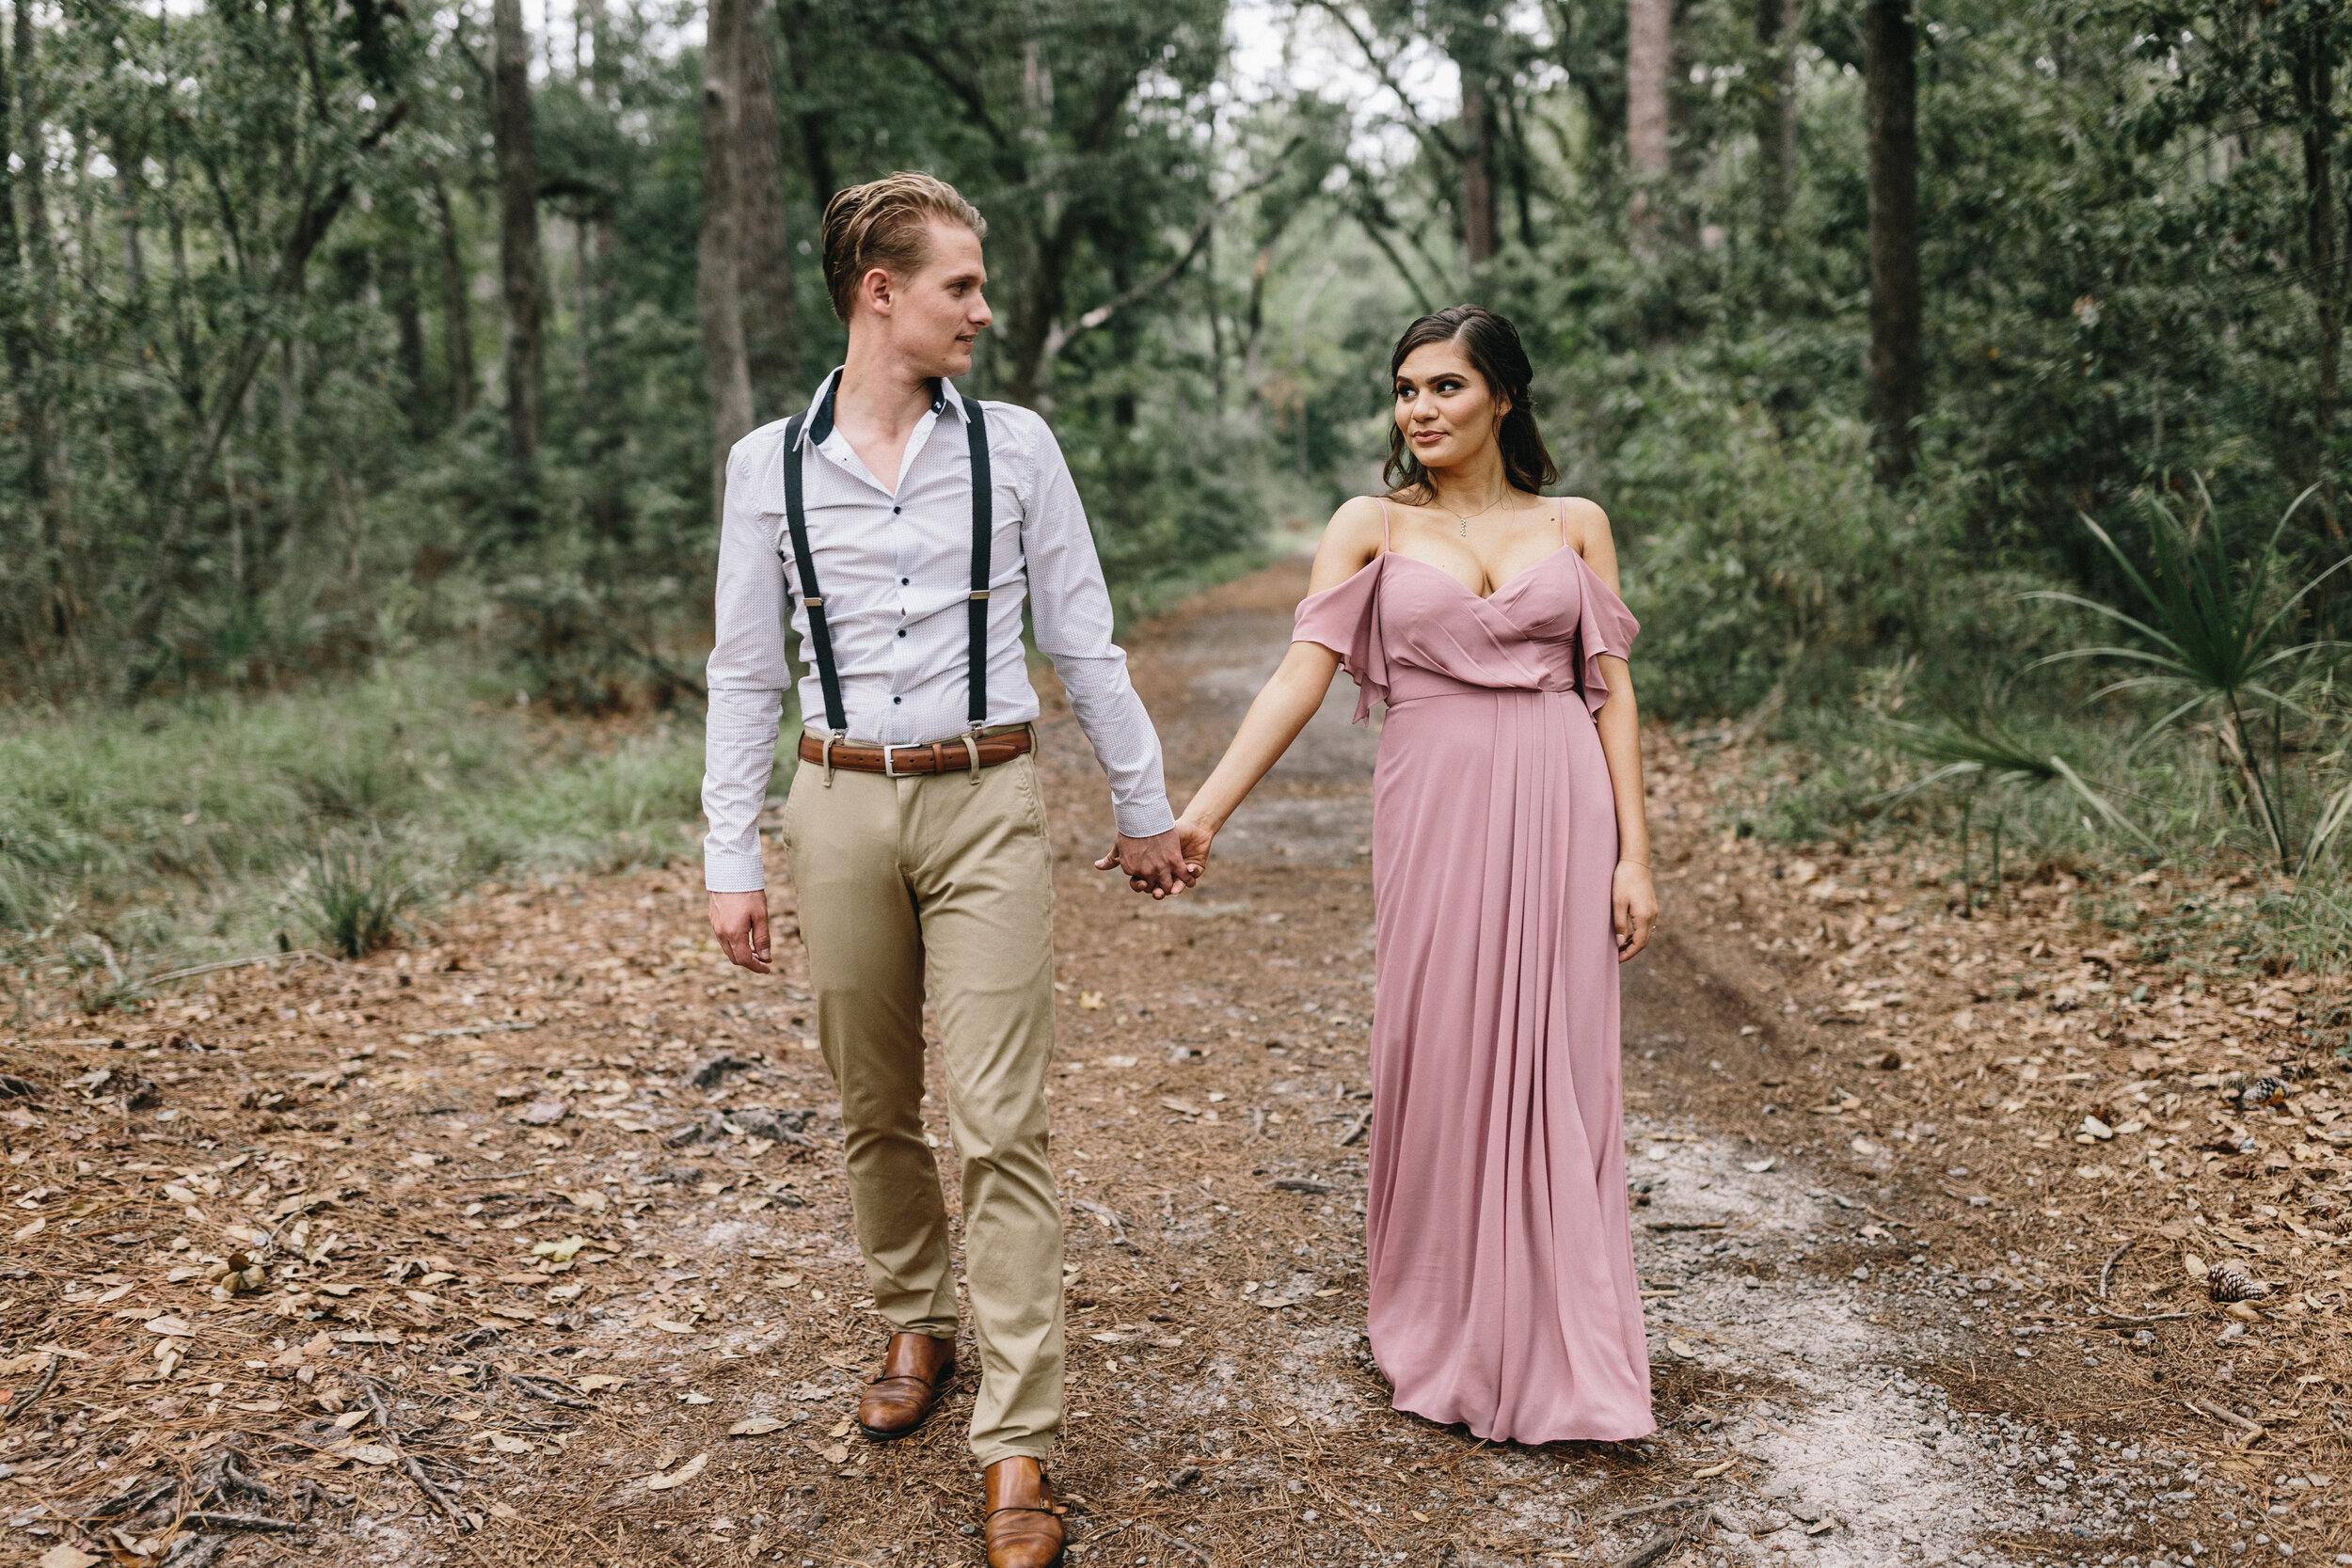 ivory-and-beau-couple-weddings-engagement-session-savannah-weddings-Mary+Cameron_engagementsession-15.jpg